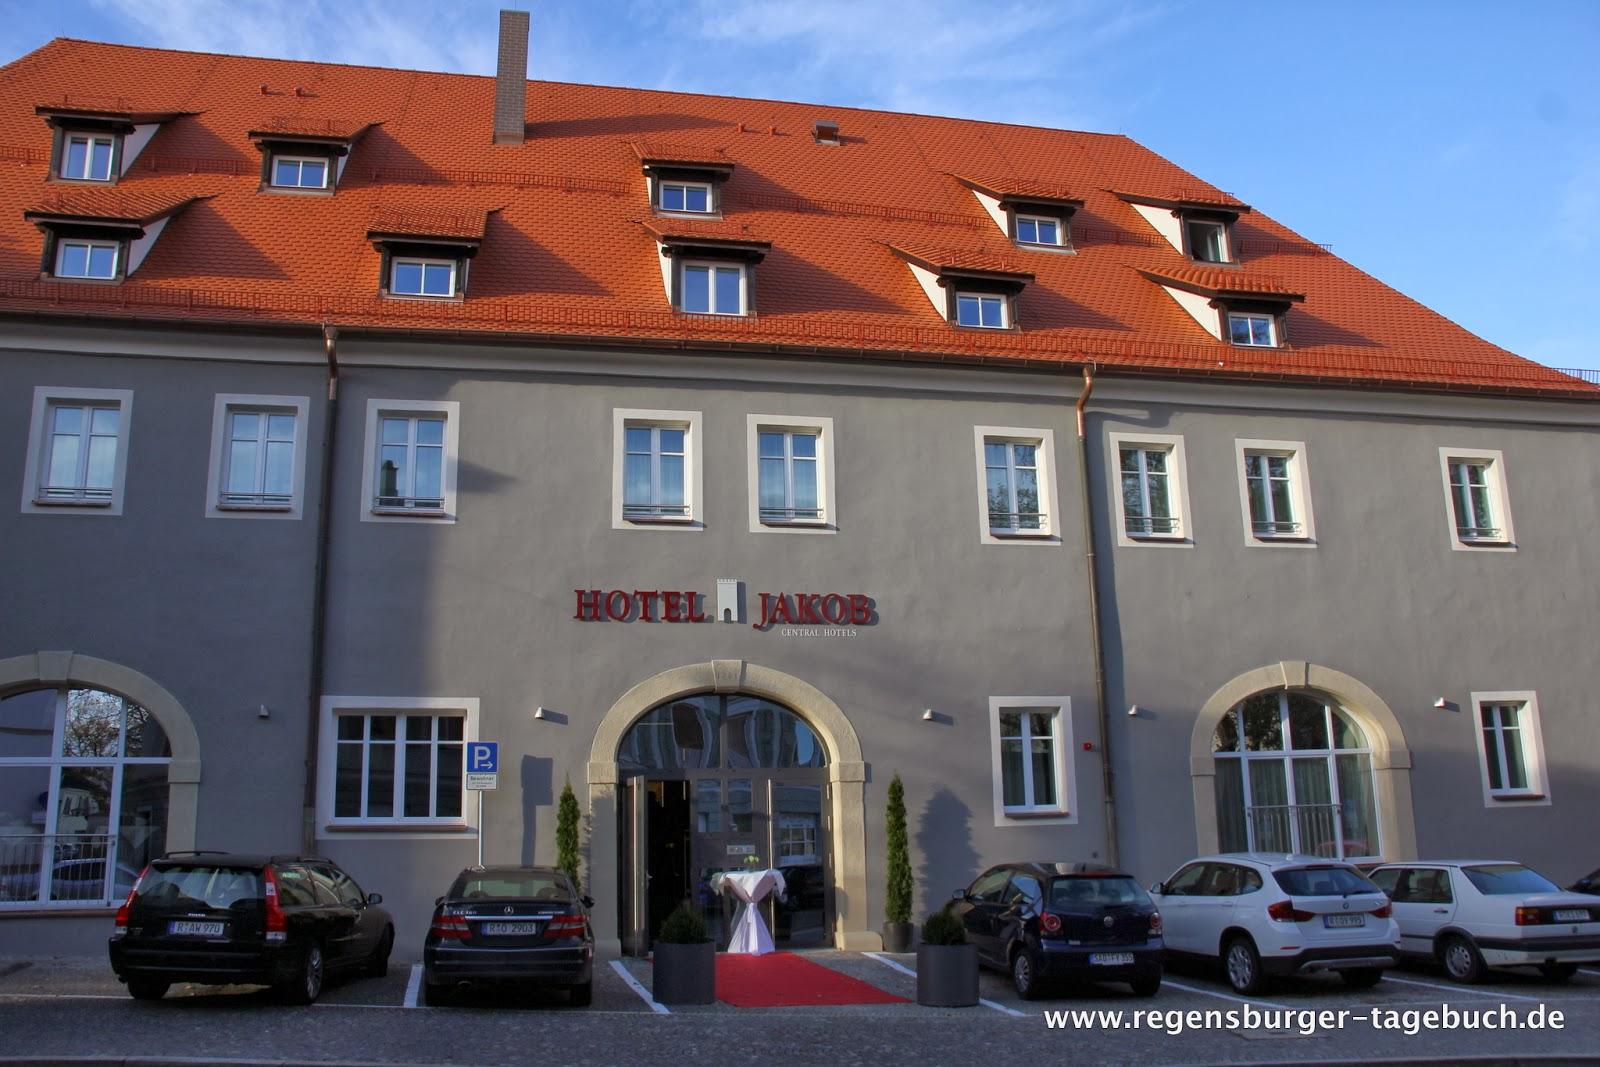 Regensburg Casino